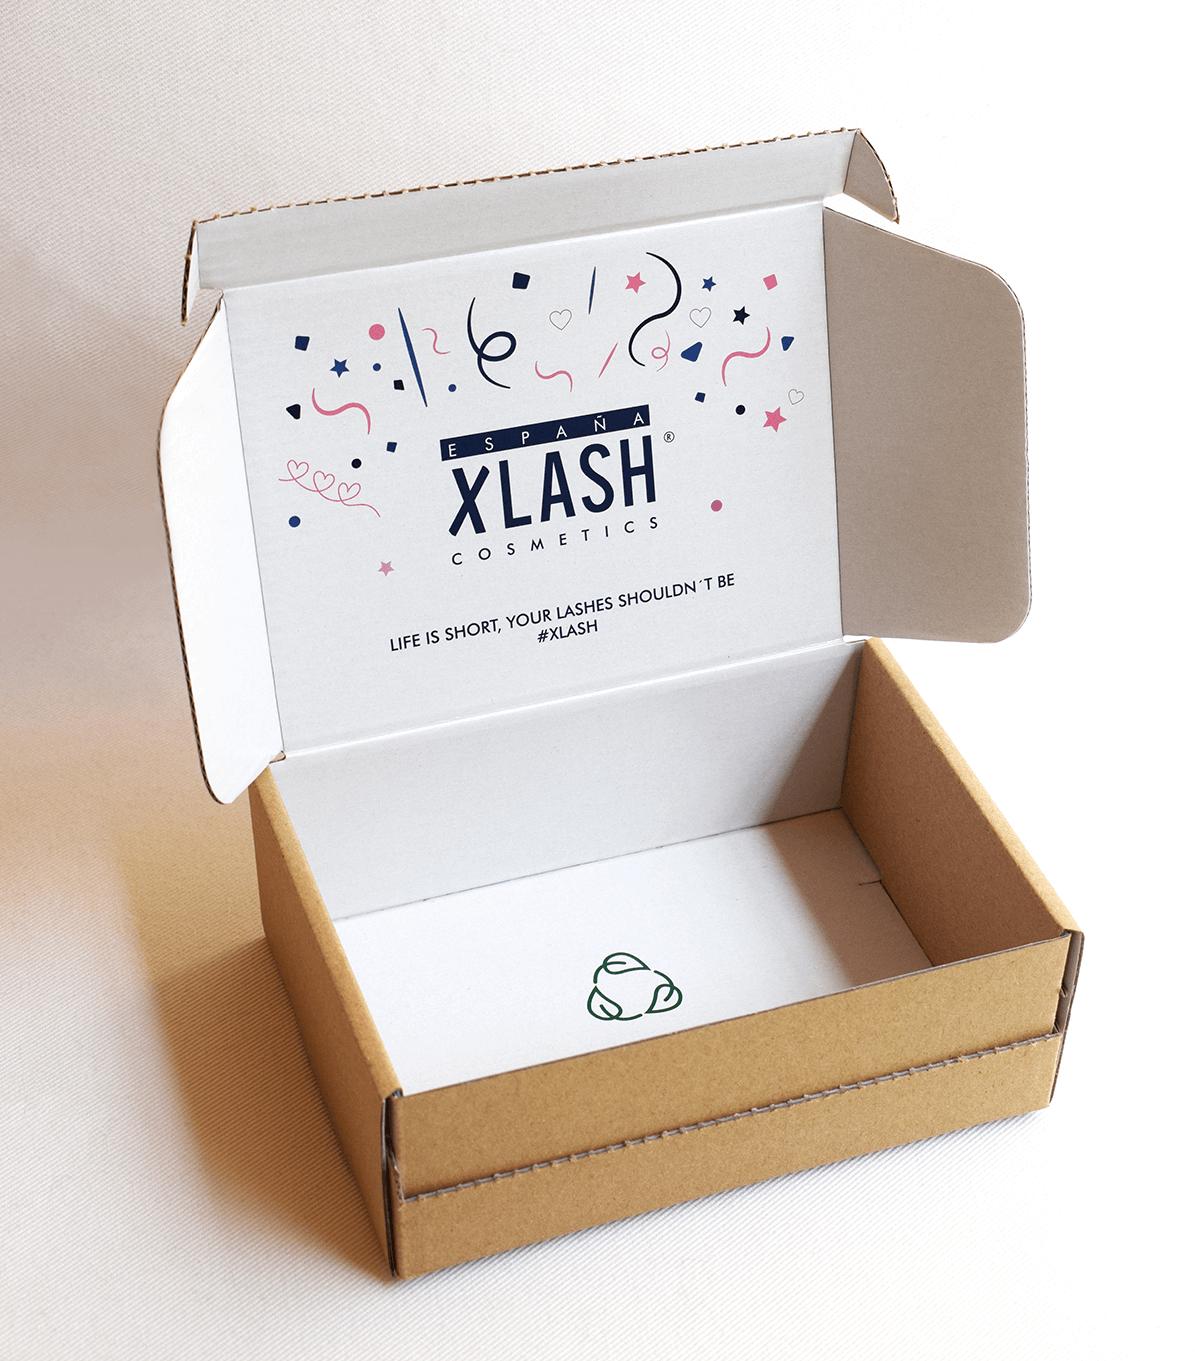 Caja Xlash para enviar paquetes por correo